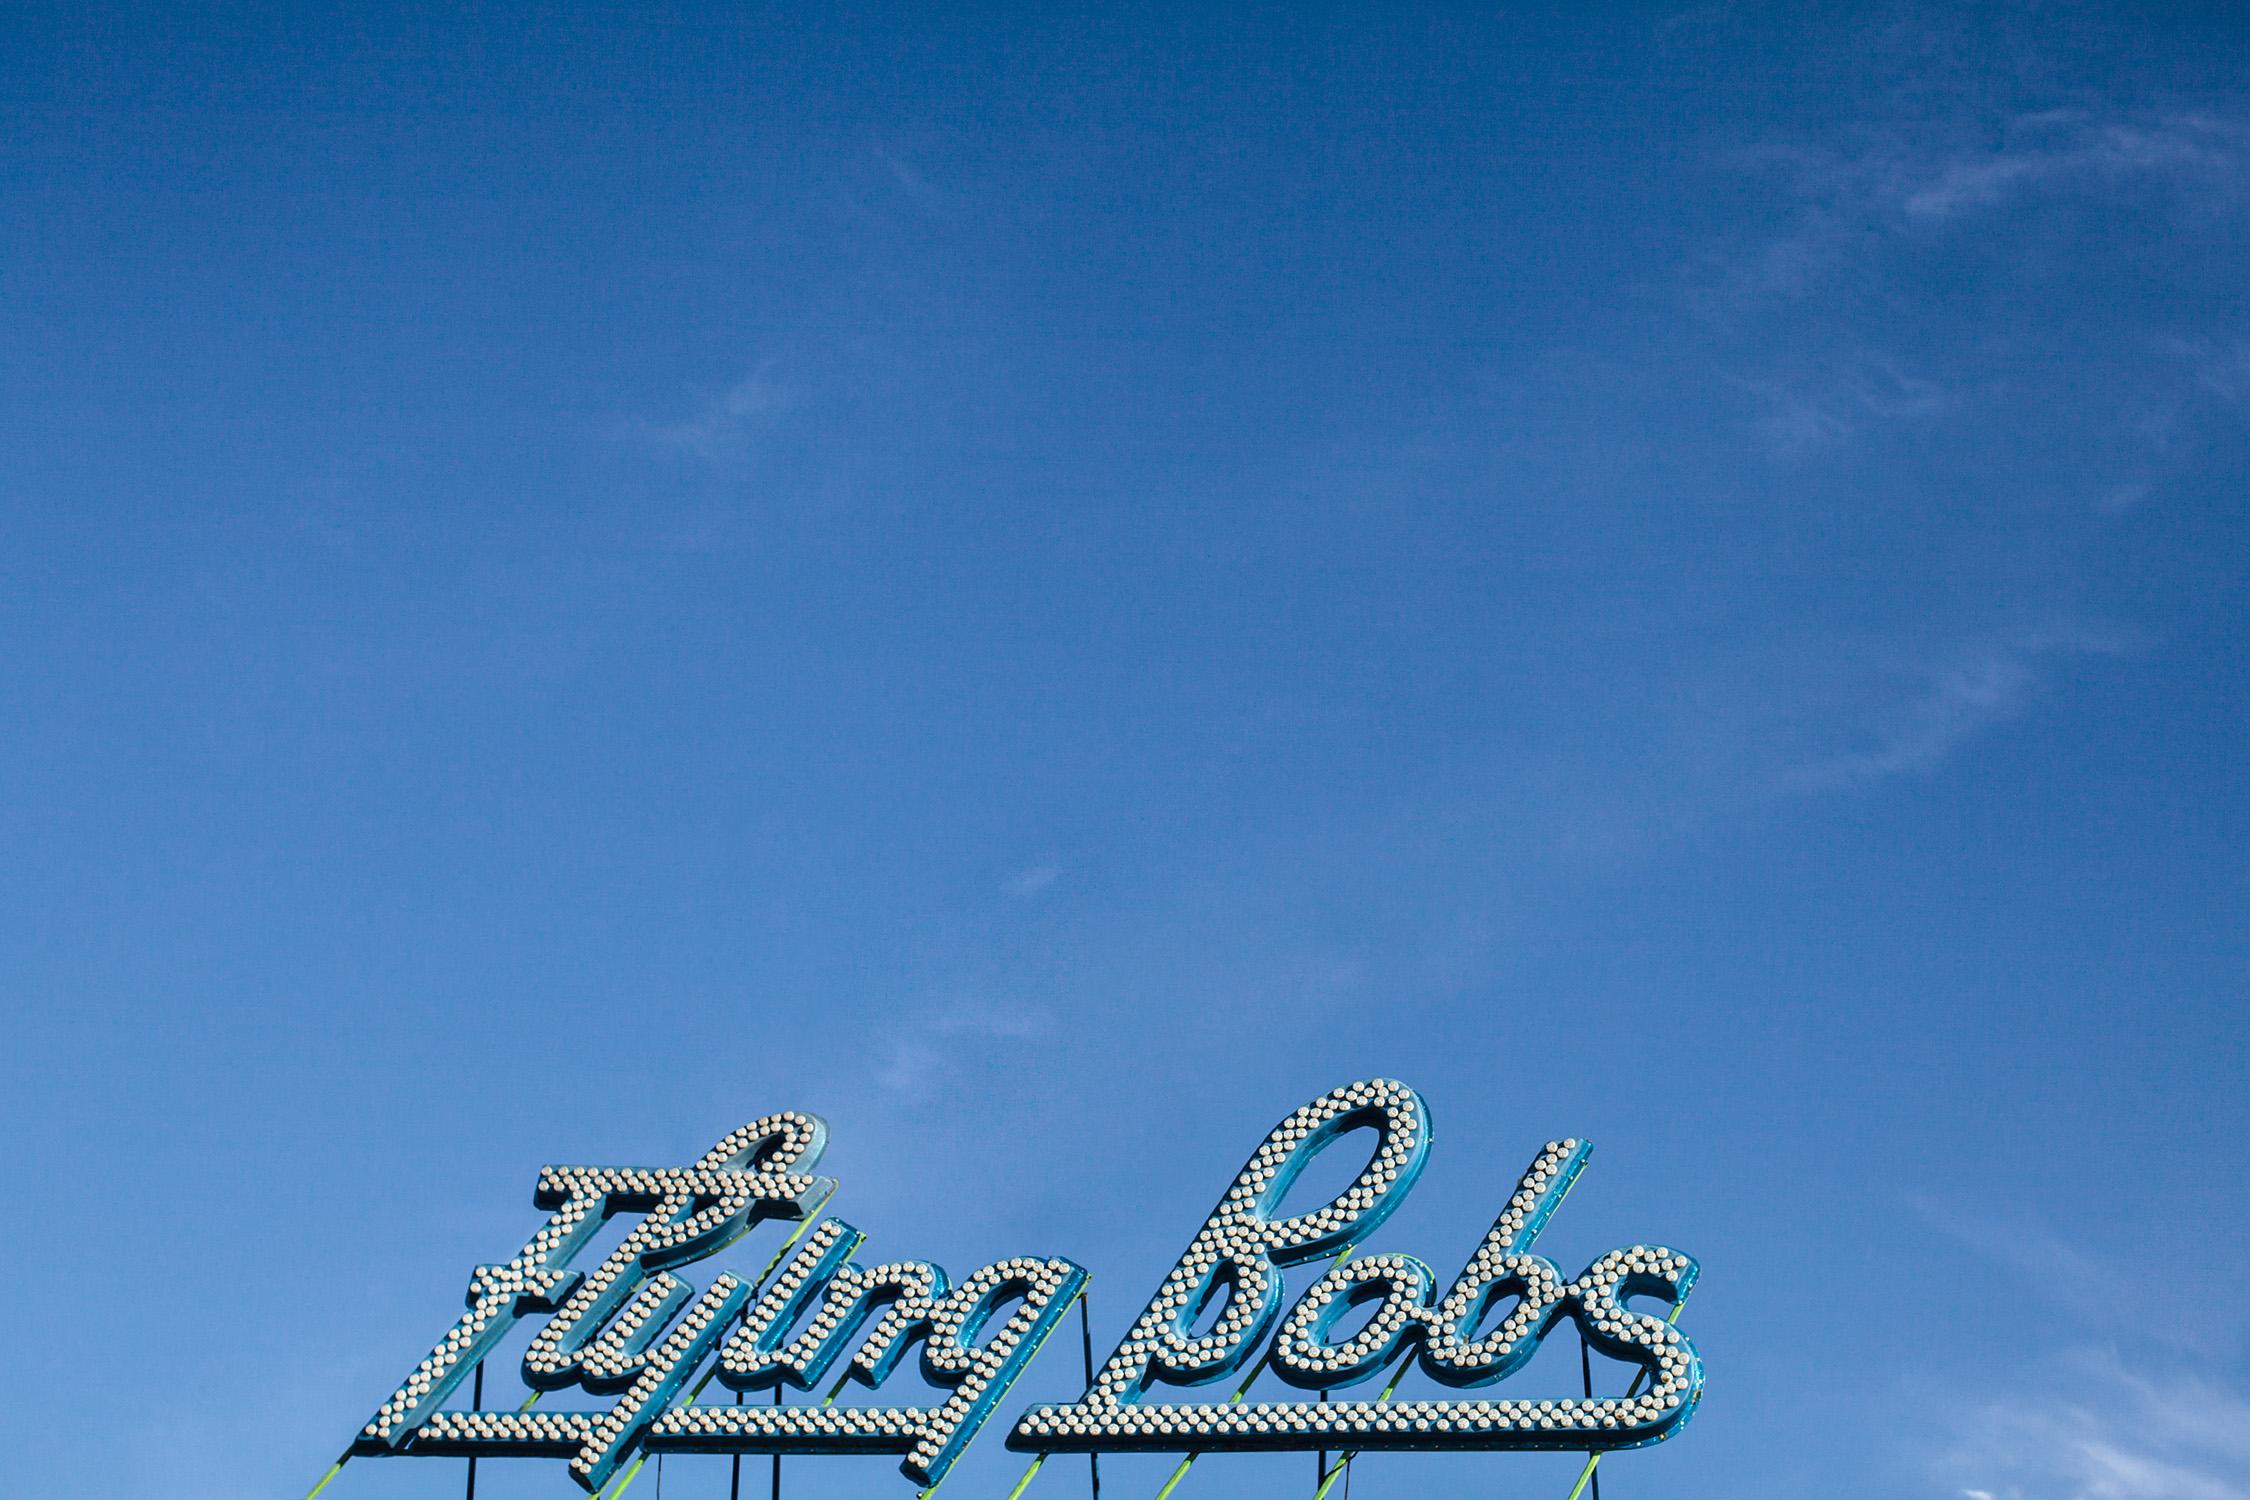 lifestyle-editorial-washington-dc-malek-naz-photography-montgomery-county-fair-flying-bob.jpg